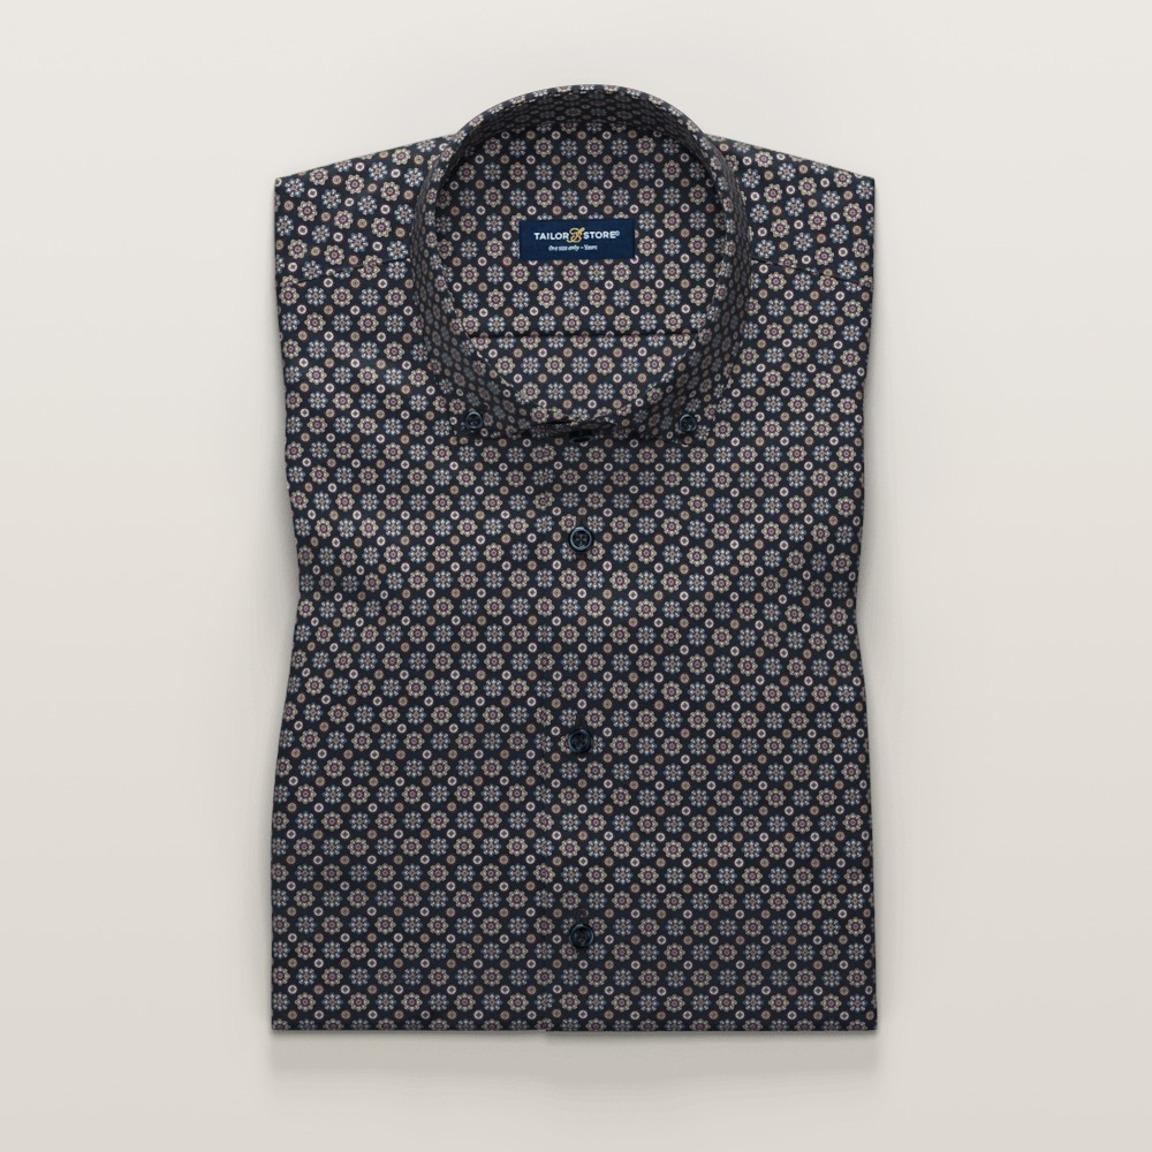 Navy printed short-sleeved dress shirt